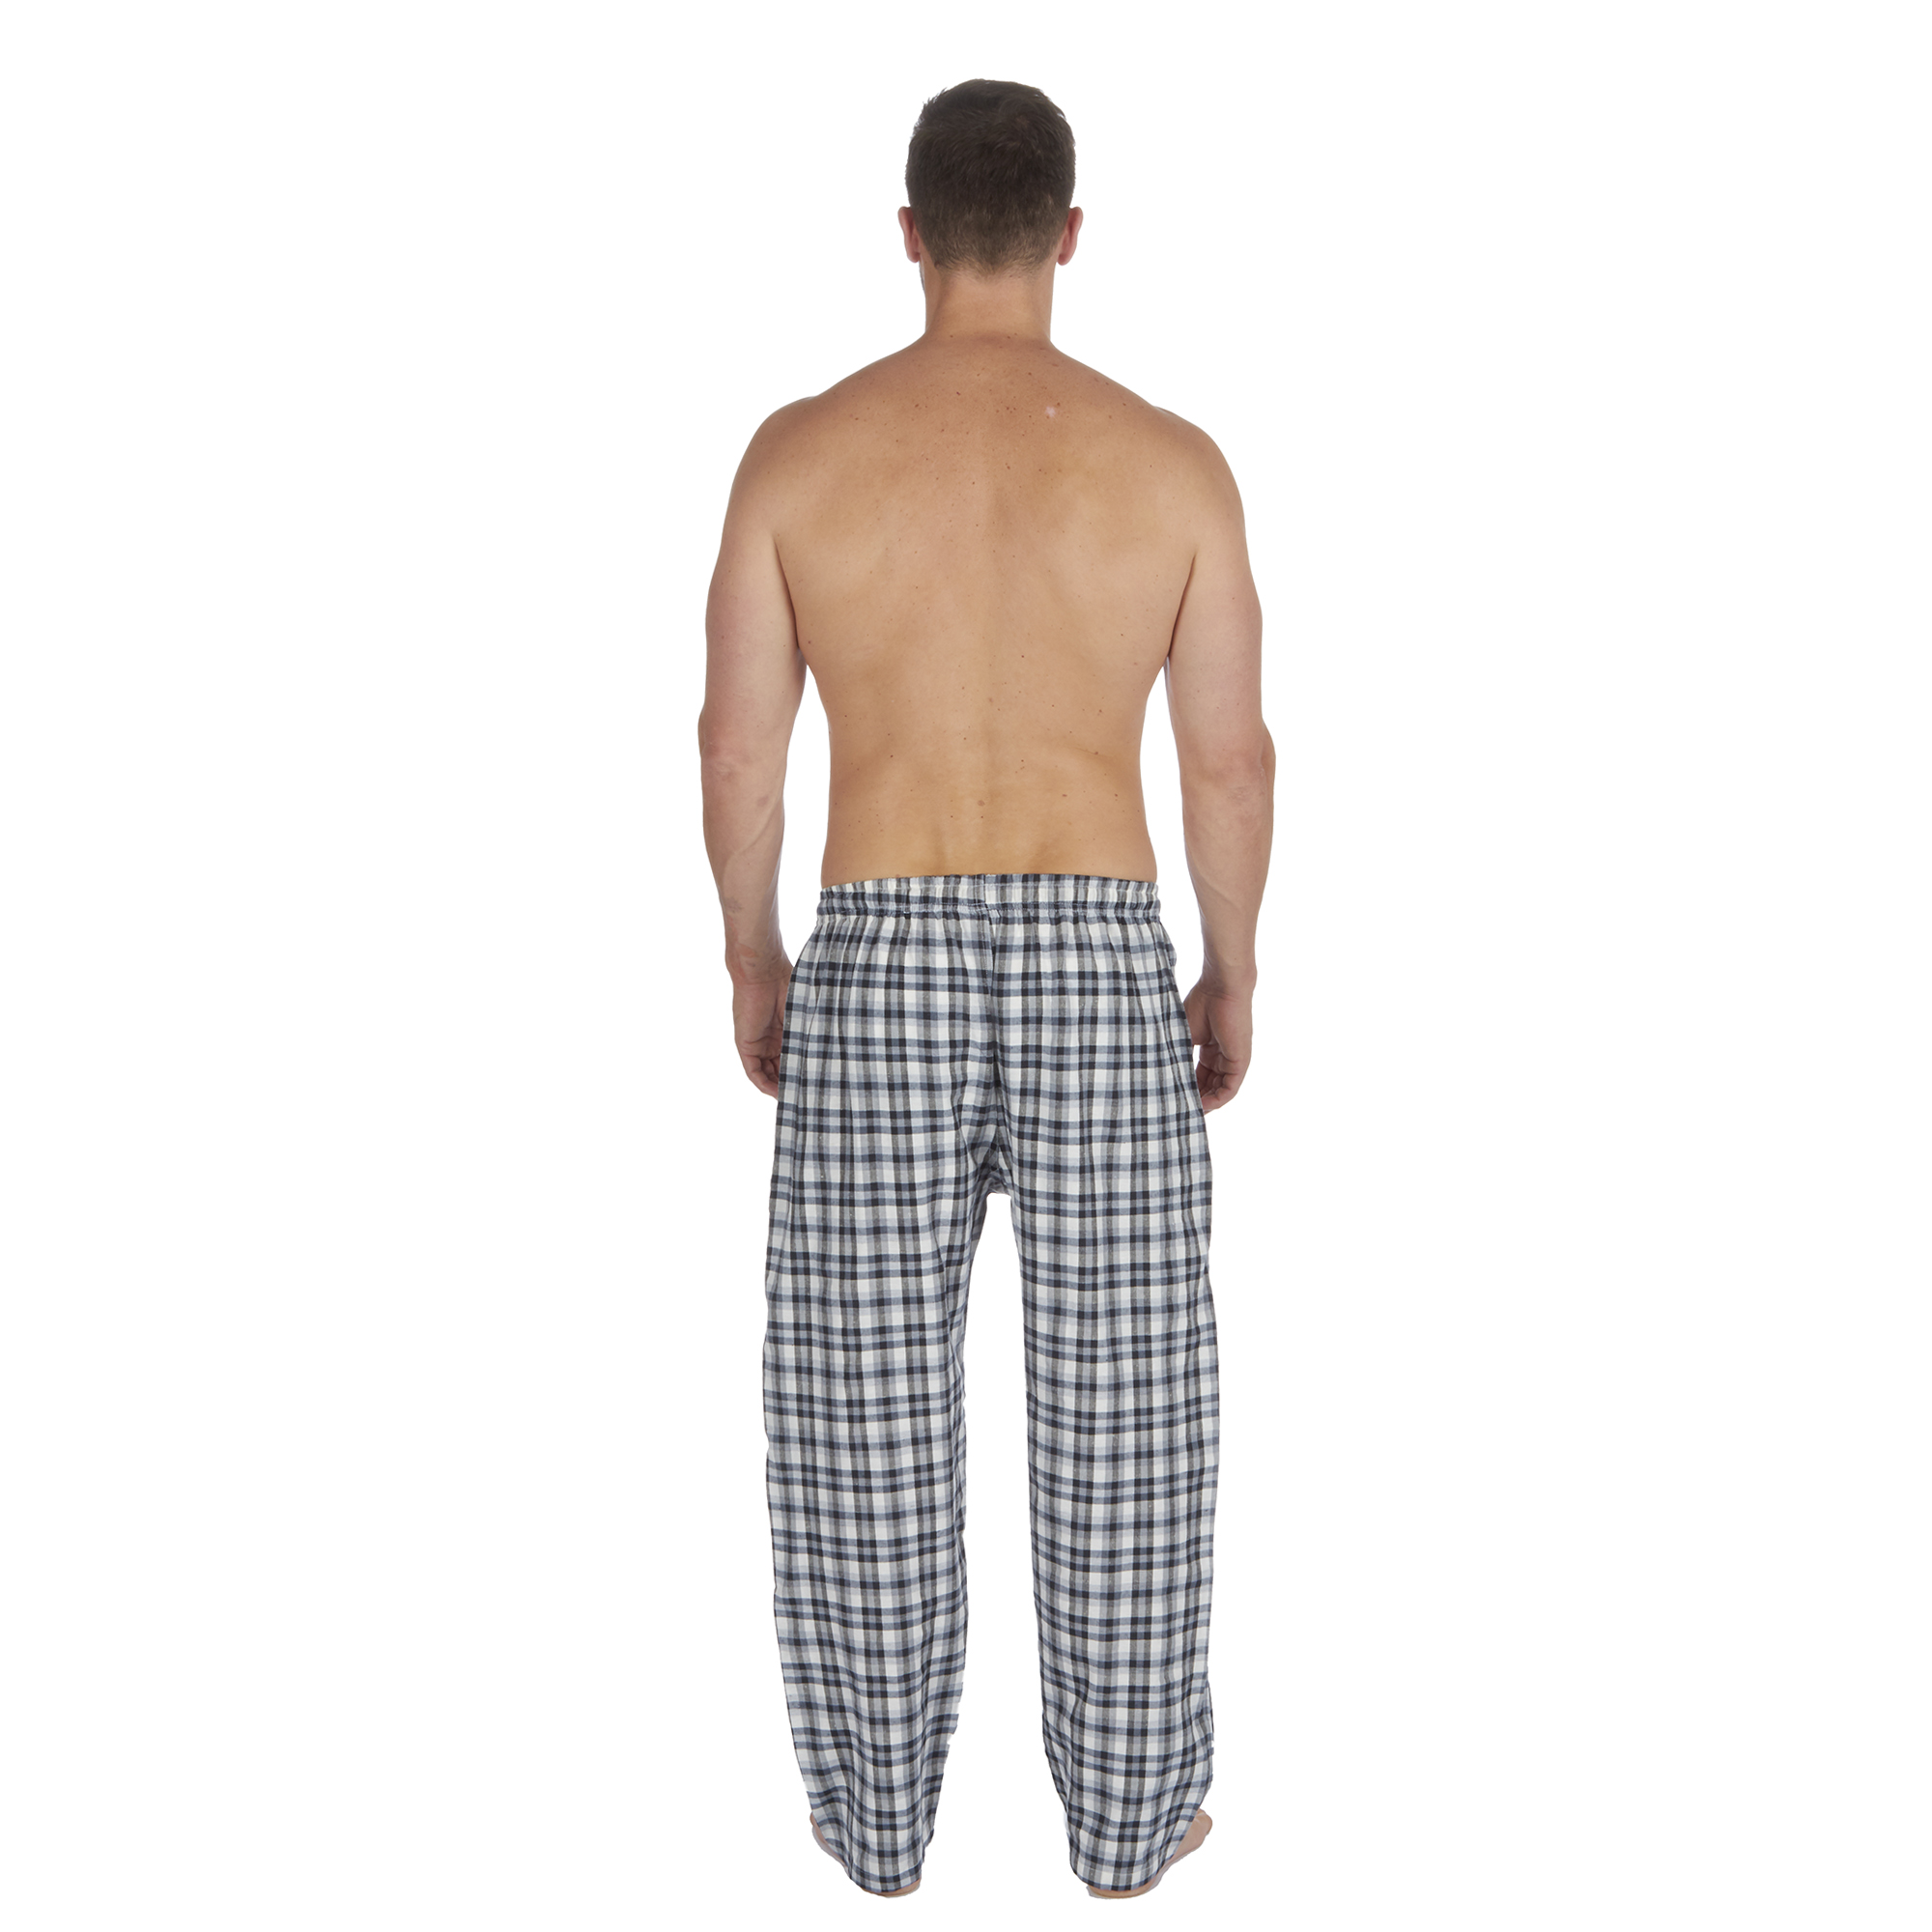 Jason-Jones-Homme-Carreaux-Tisse-Pyjama-Pantalon-en-Coton-Melange-Serge-PJ-Lounge-Pants miniature 5